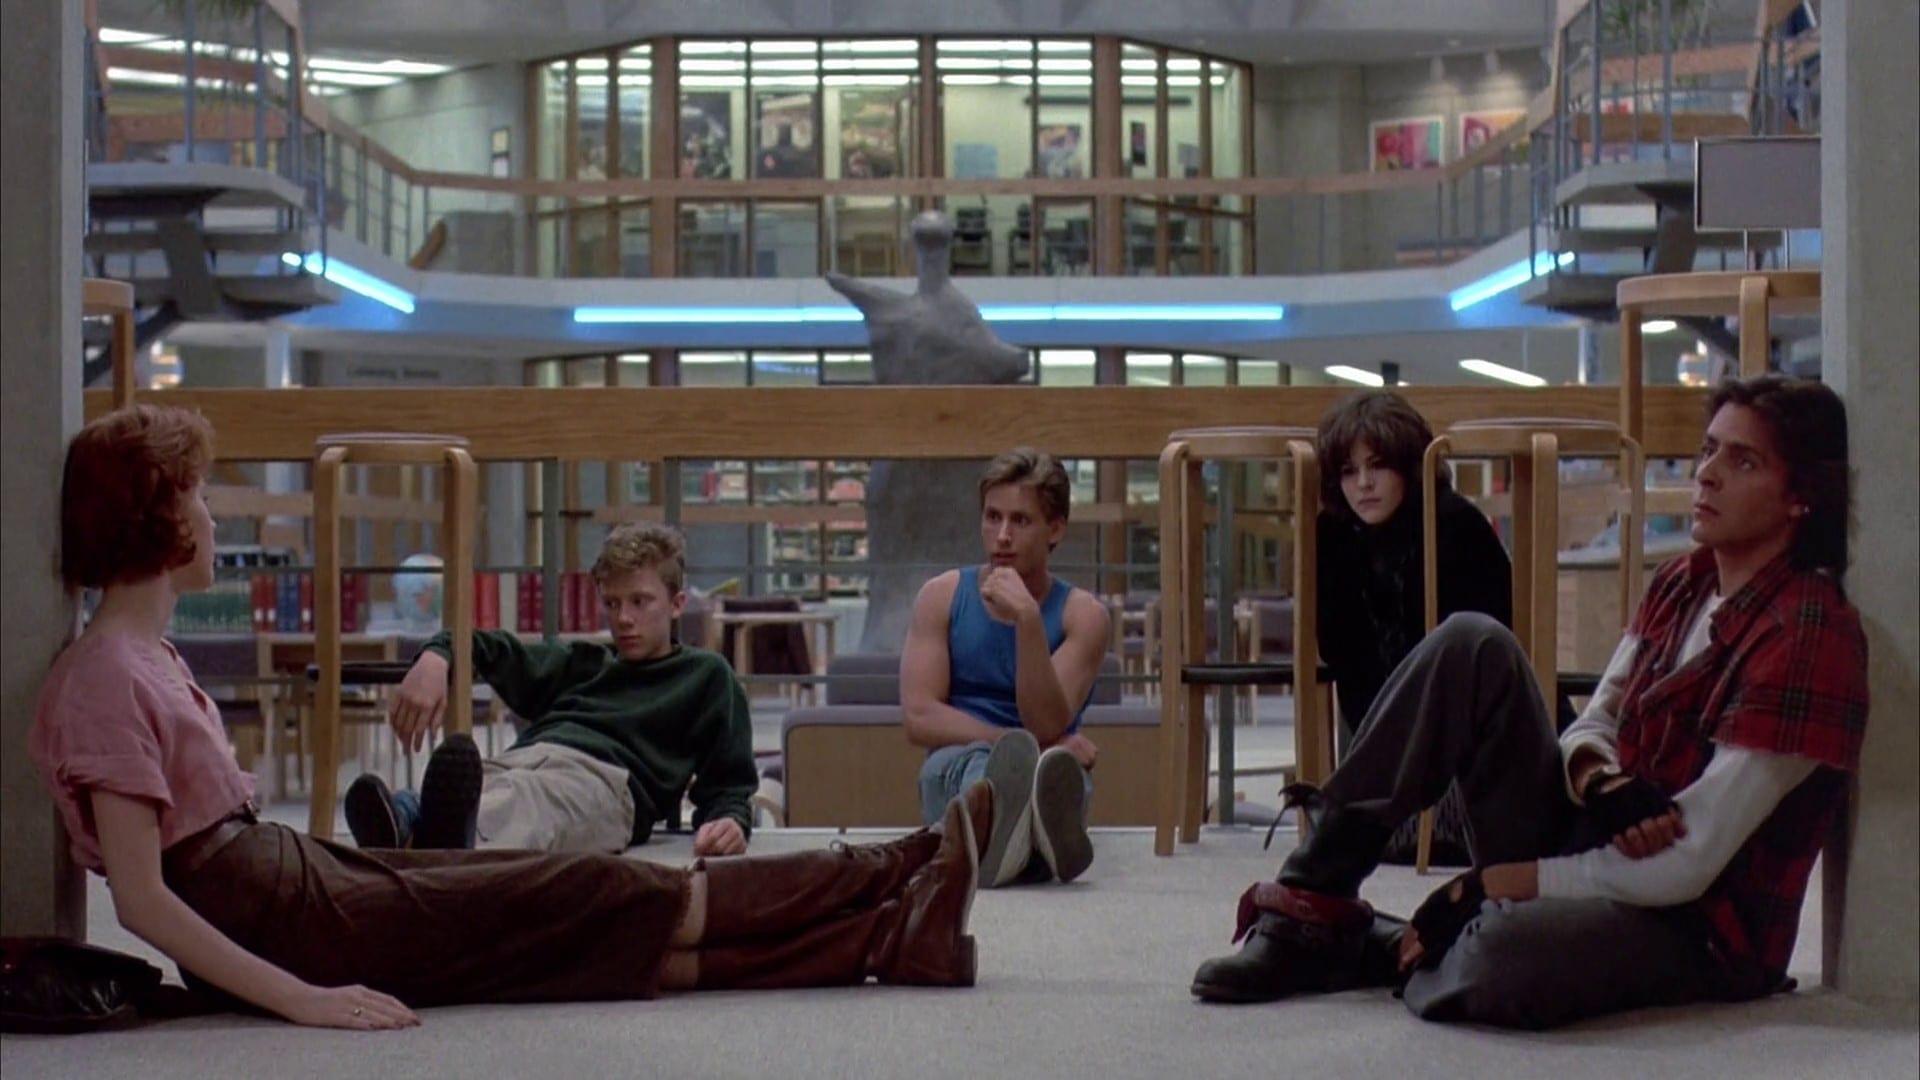 Movie Monday: The Breakfast Club